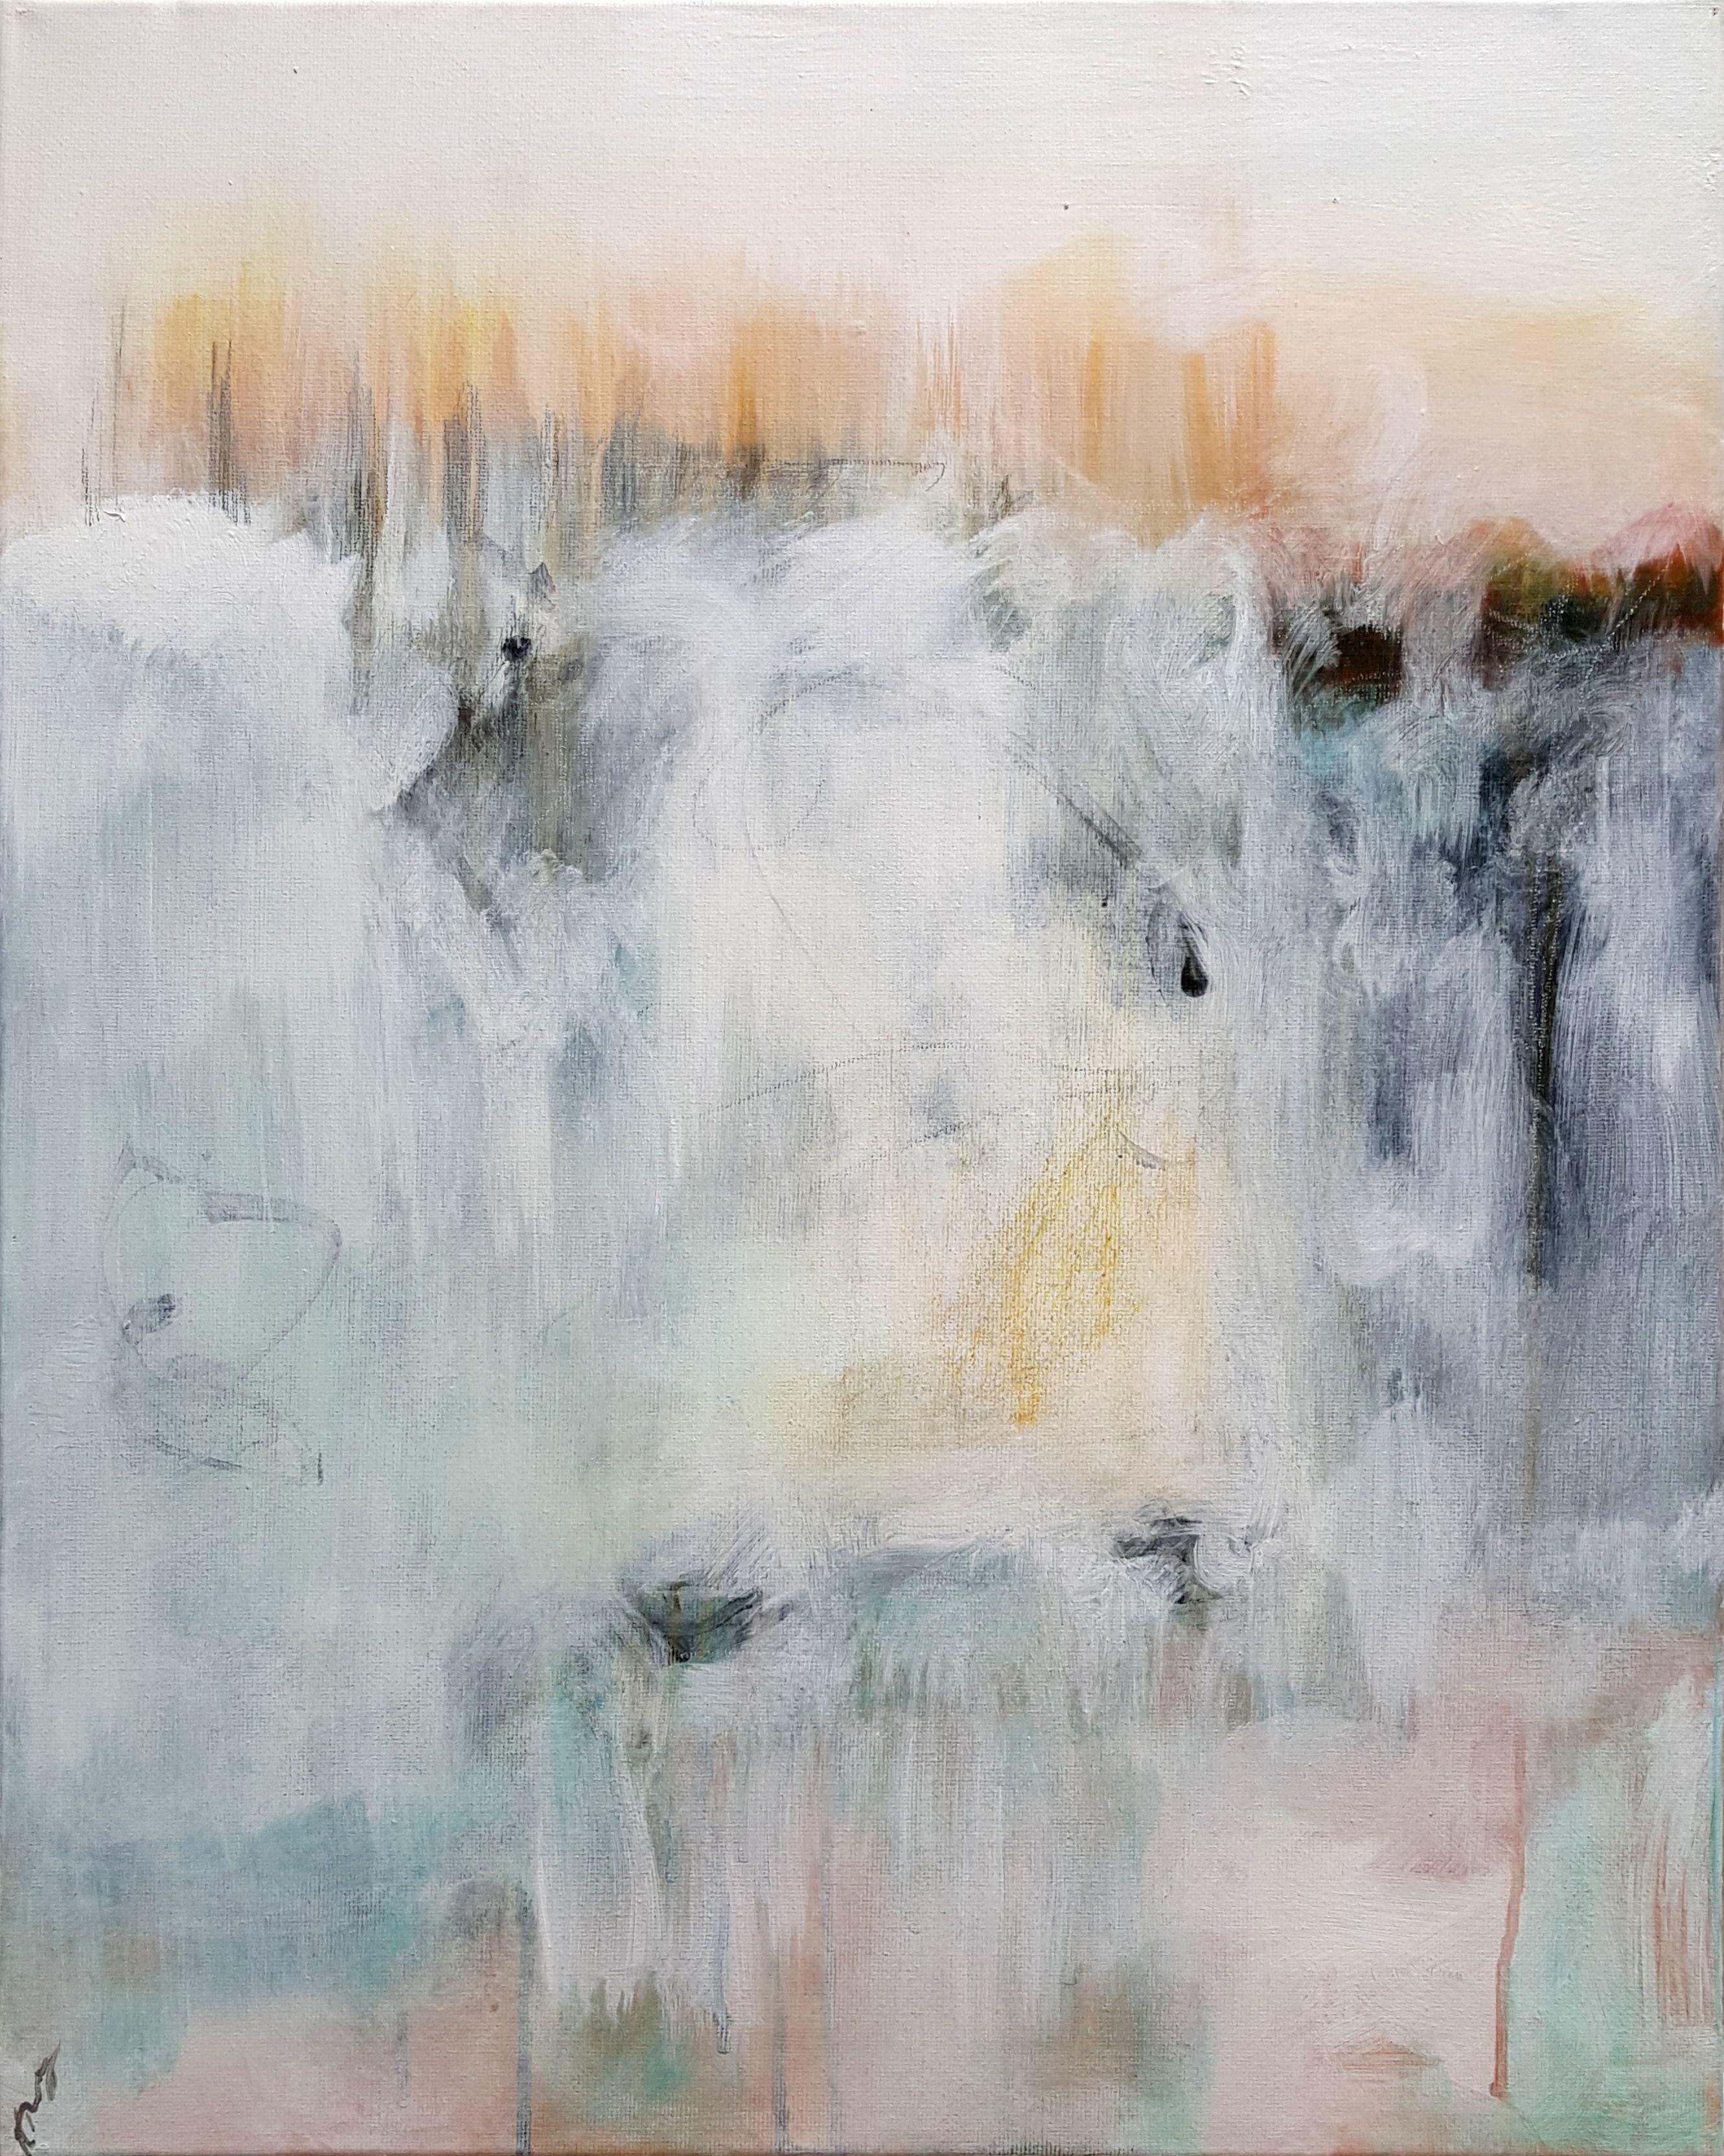 """Midnight 3"" by Kyla Dorey"